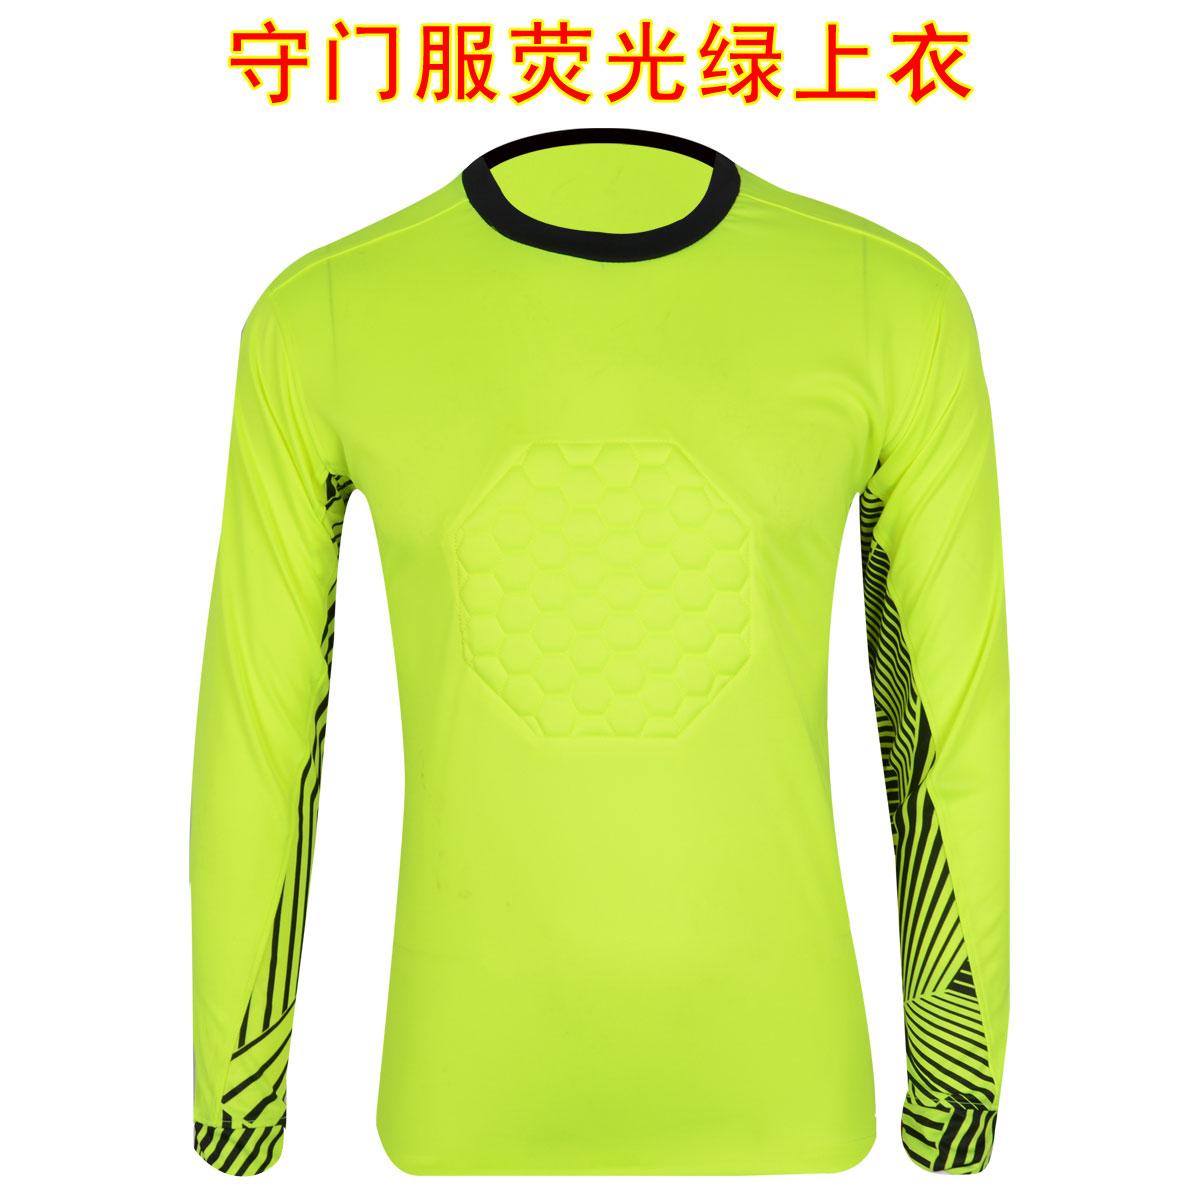 Цвет: Флуоресцентная зеленая футболка